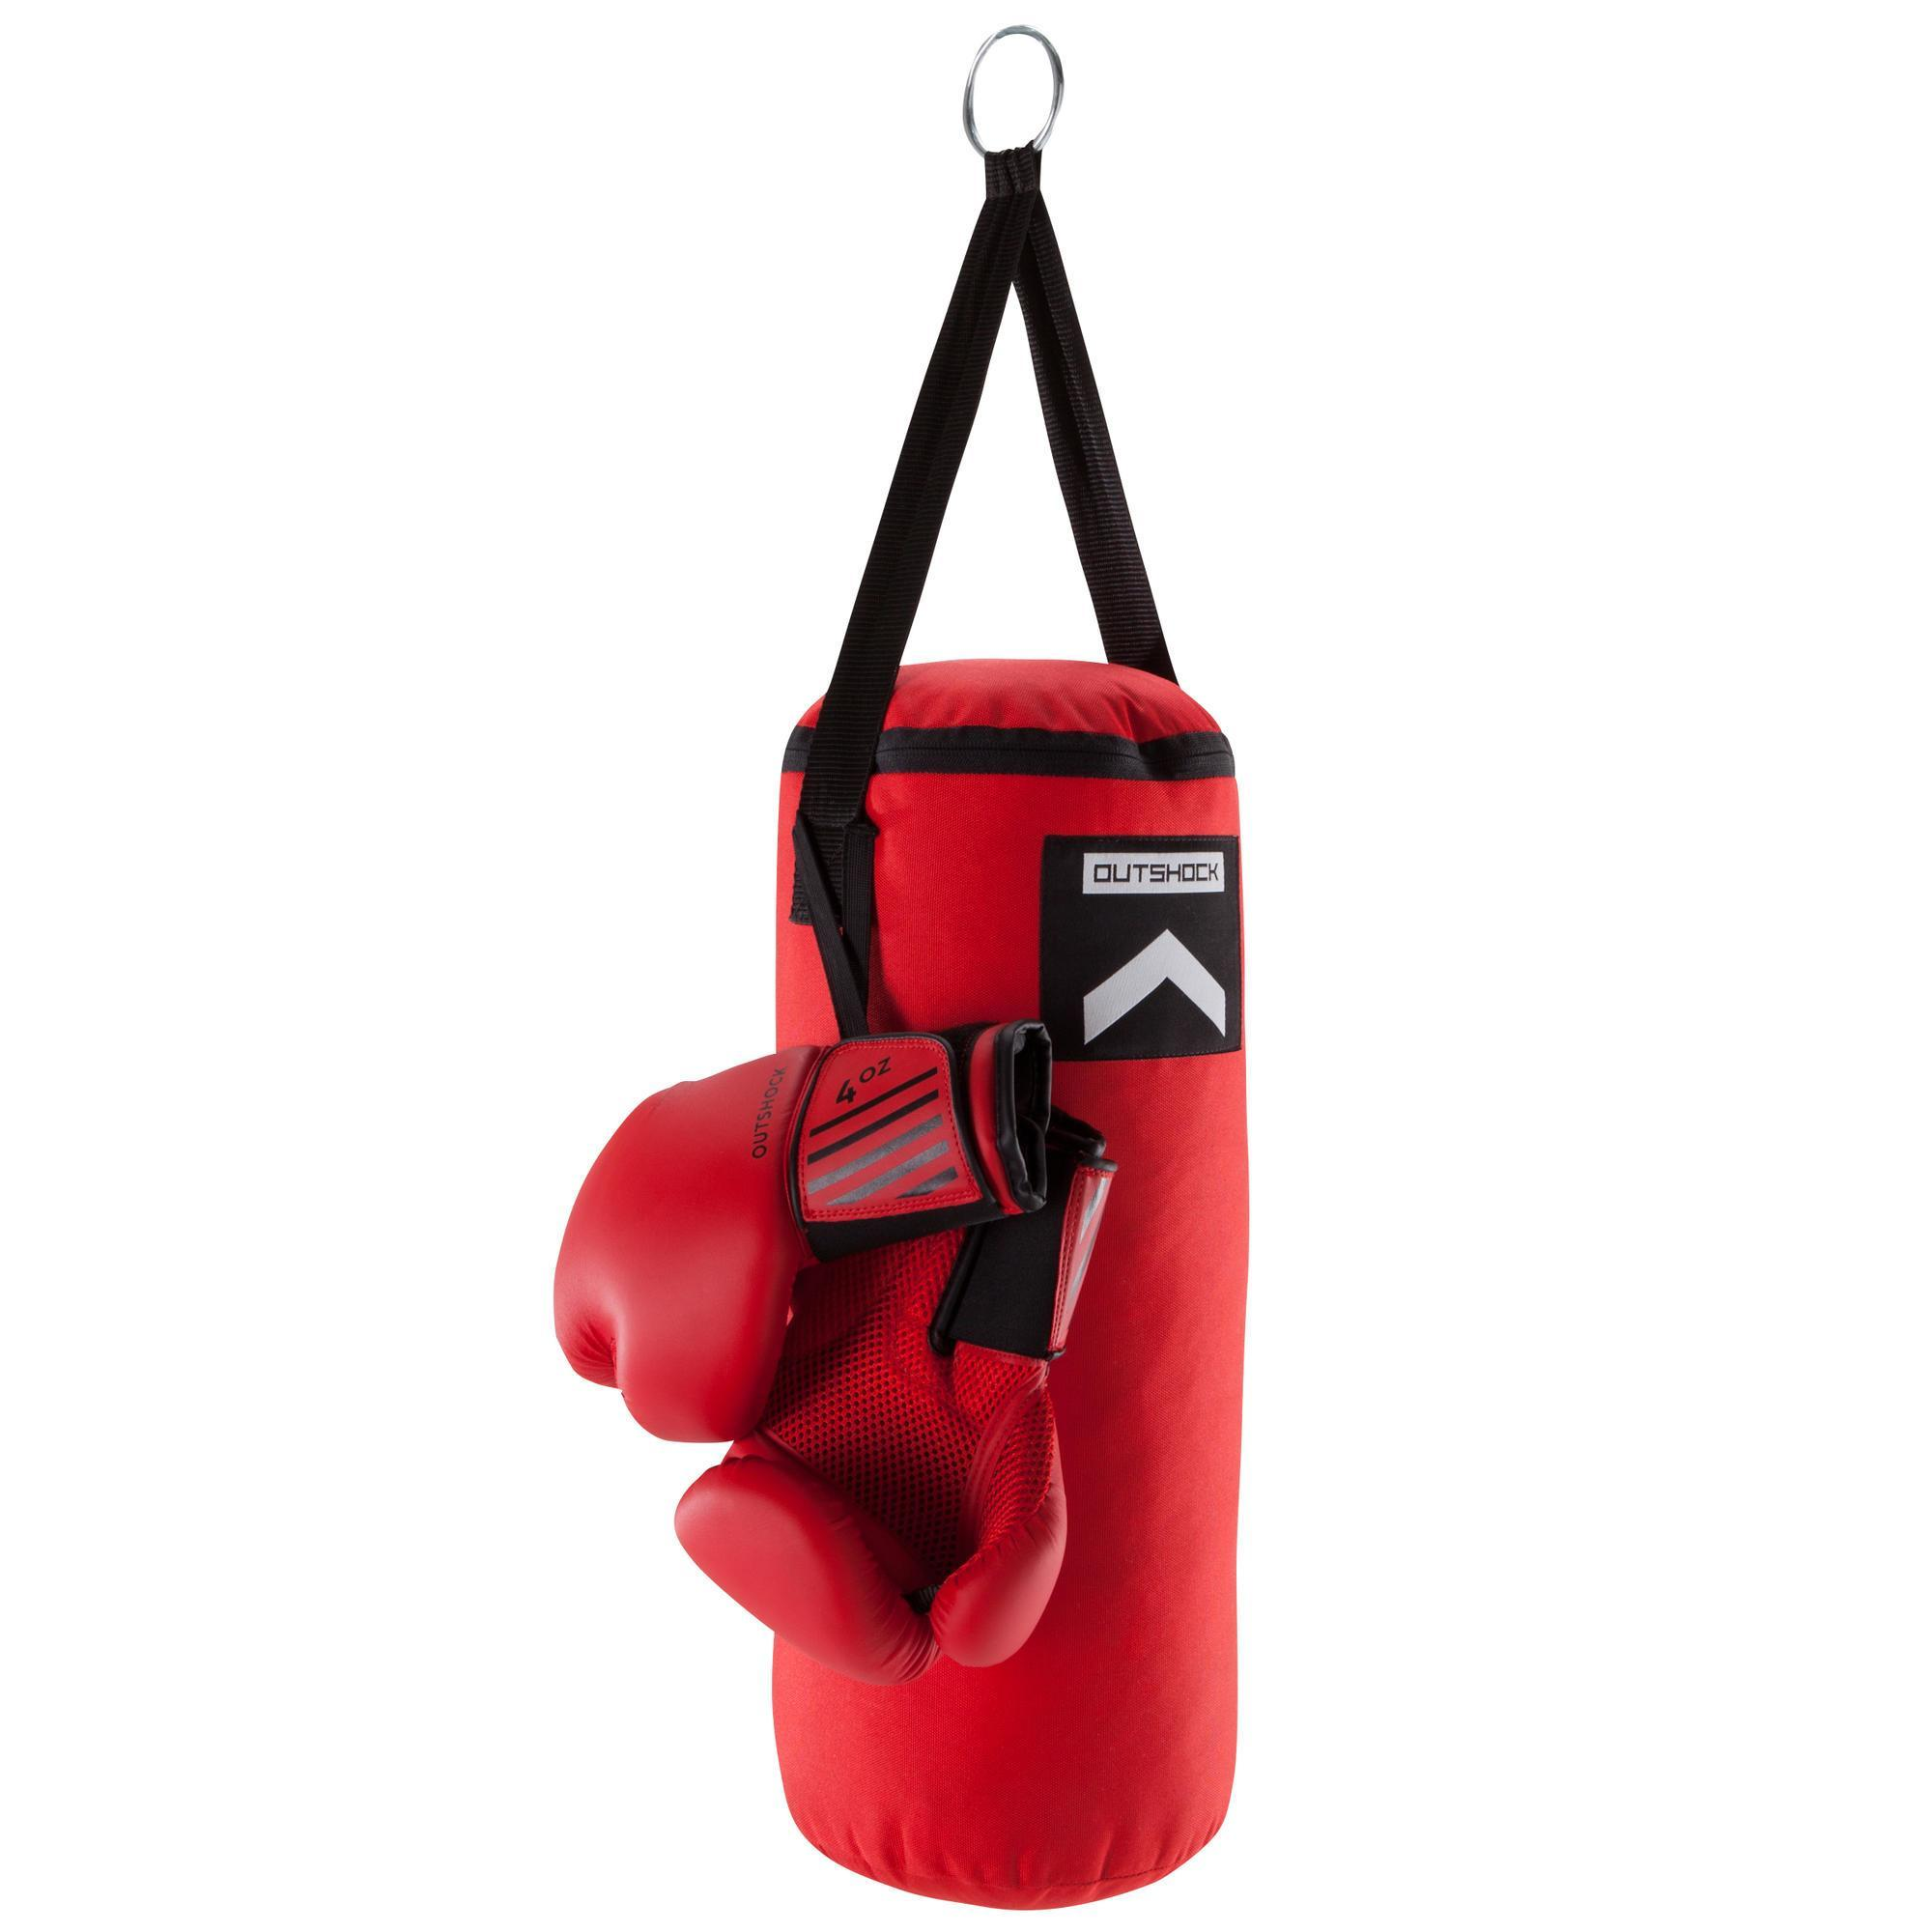 a848554f1 Comprar Sacos de Boxeo online   Decathlon